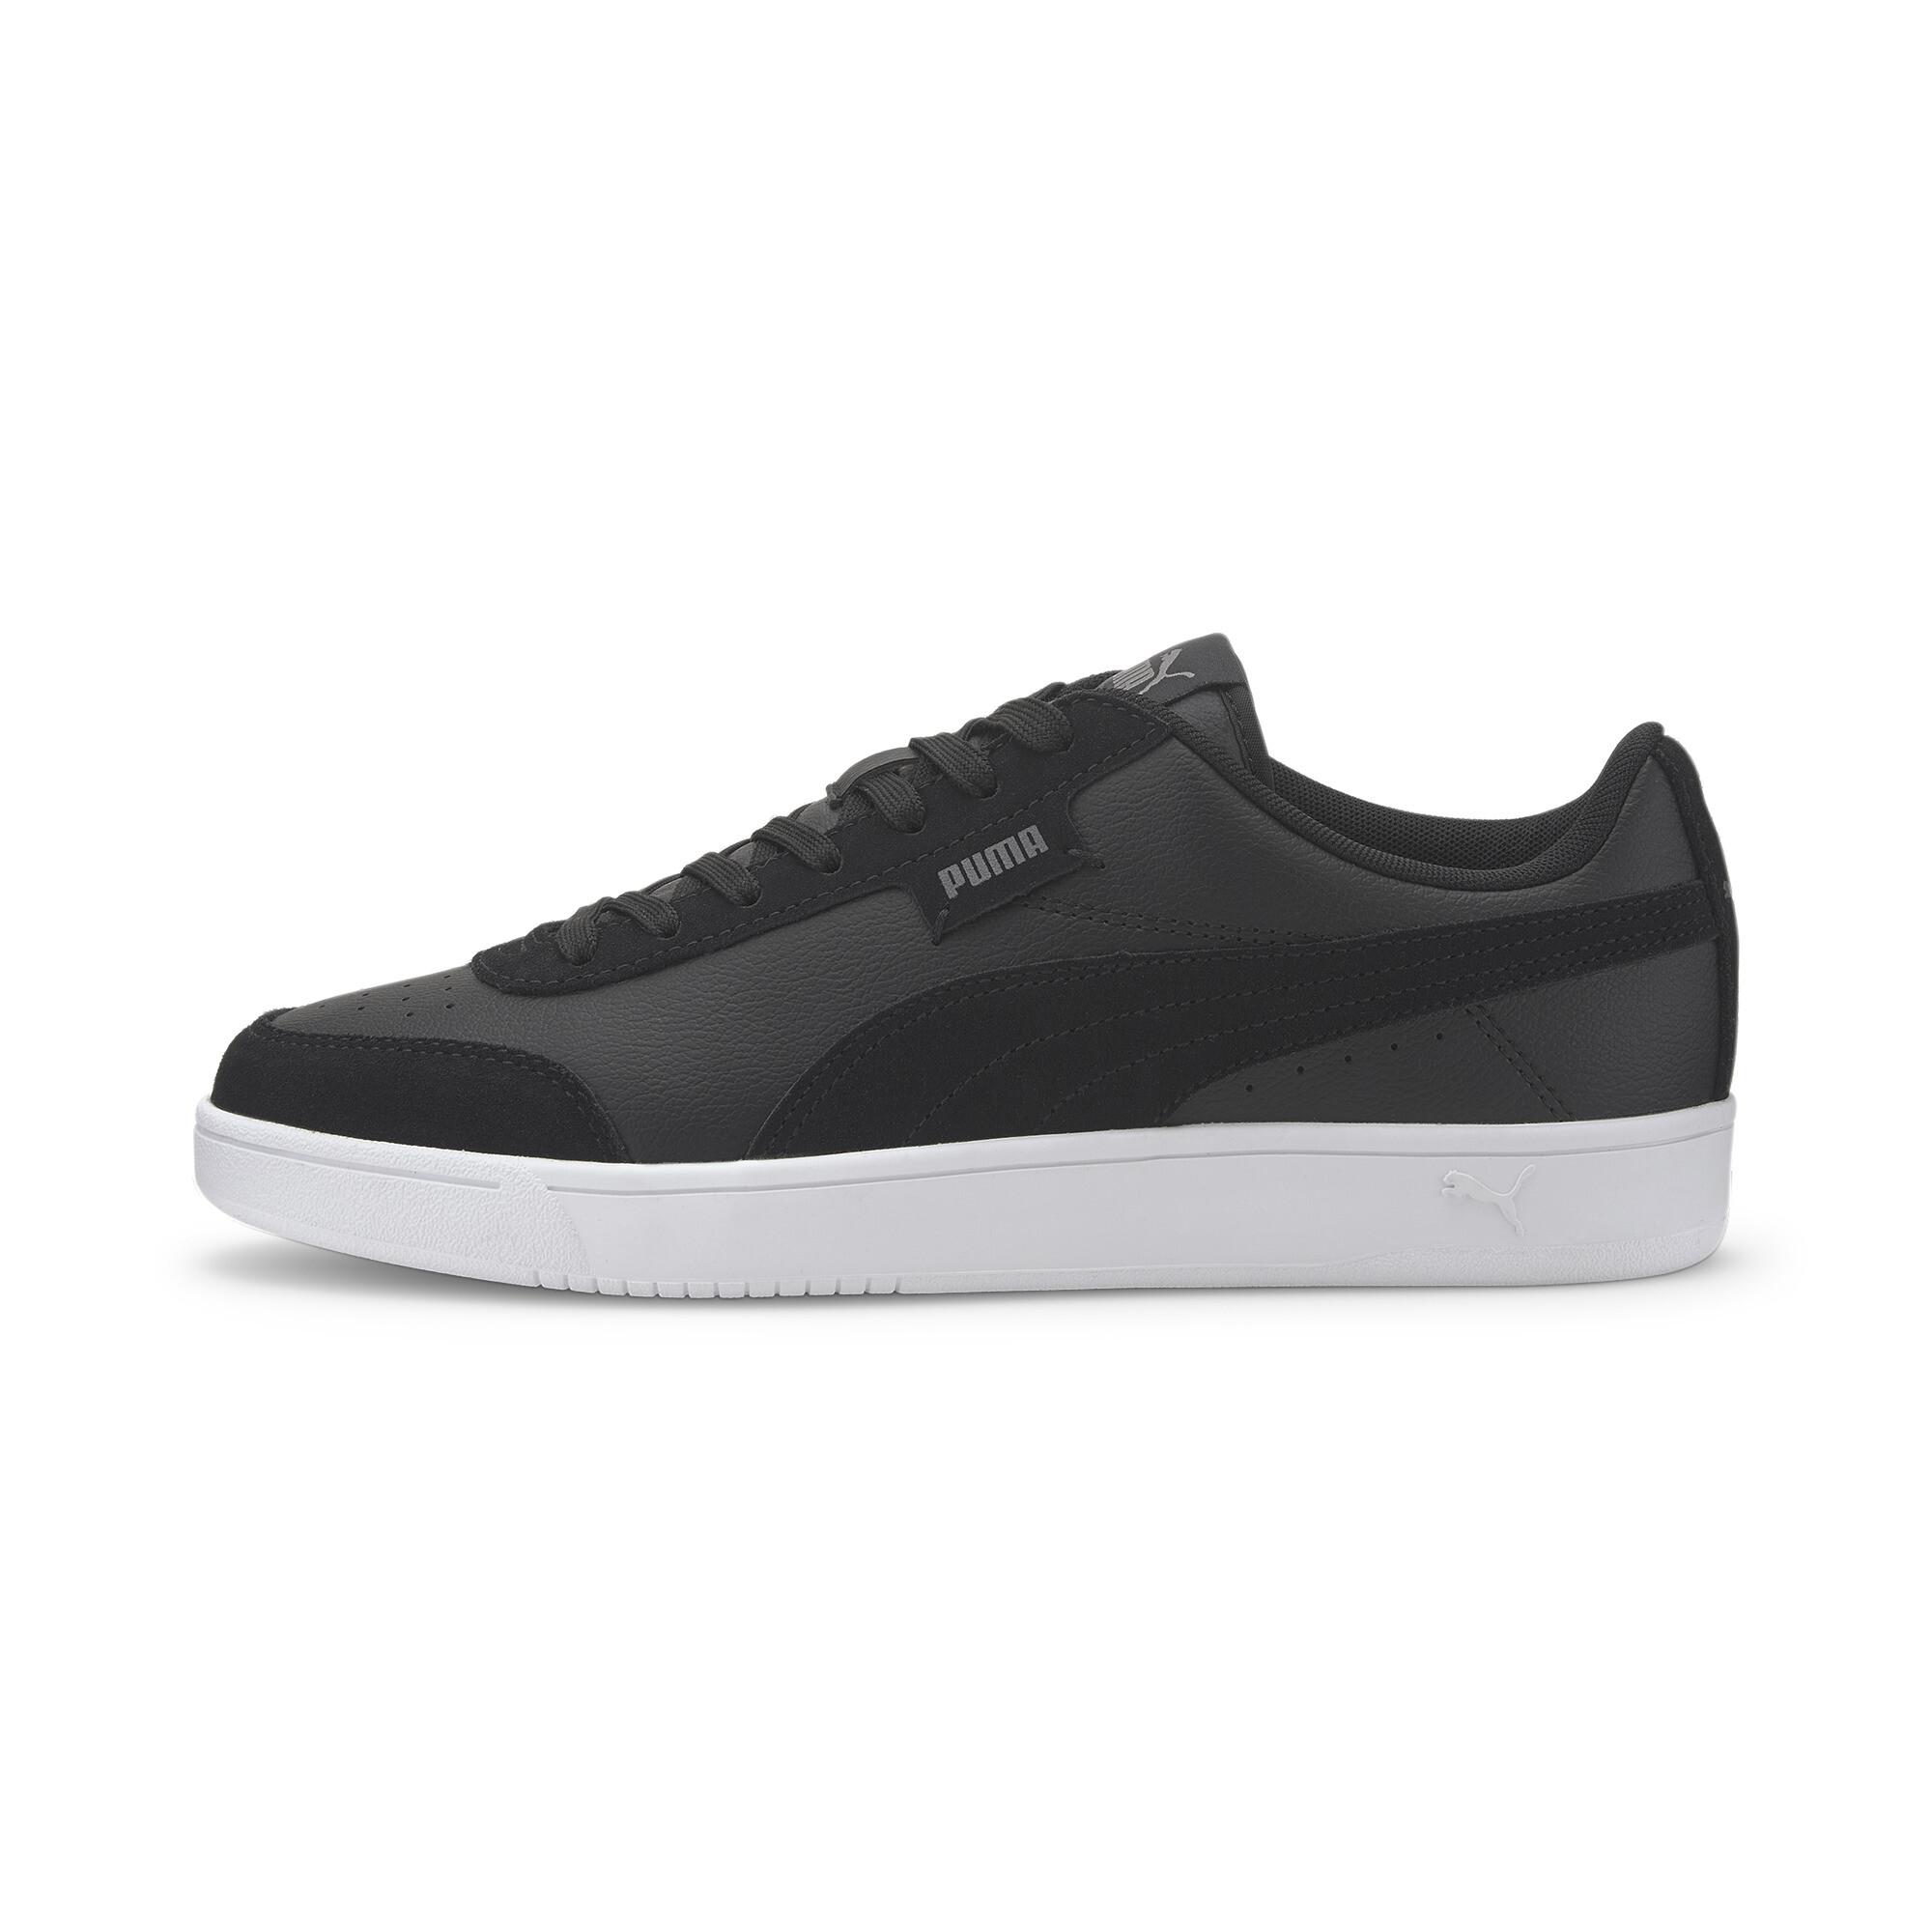 Indexbild 23 - PUMA Court Legend Lo Sneaker Unisex Schuhe Basics Neu